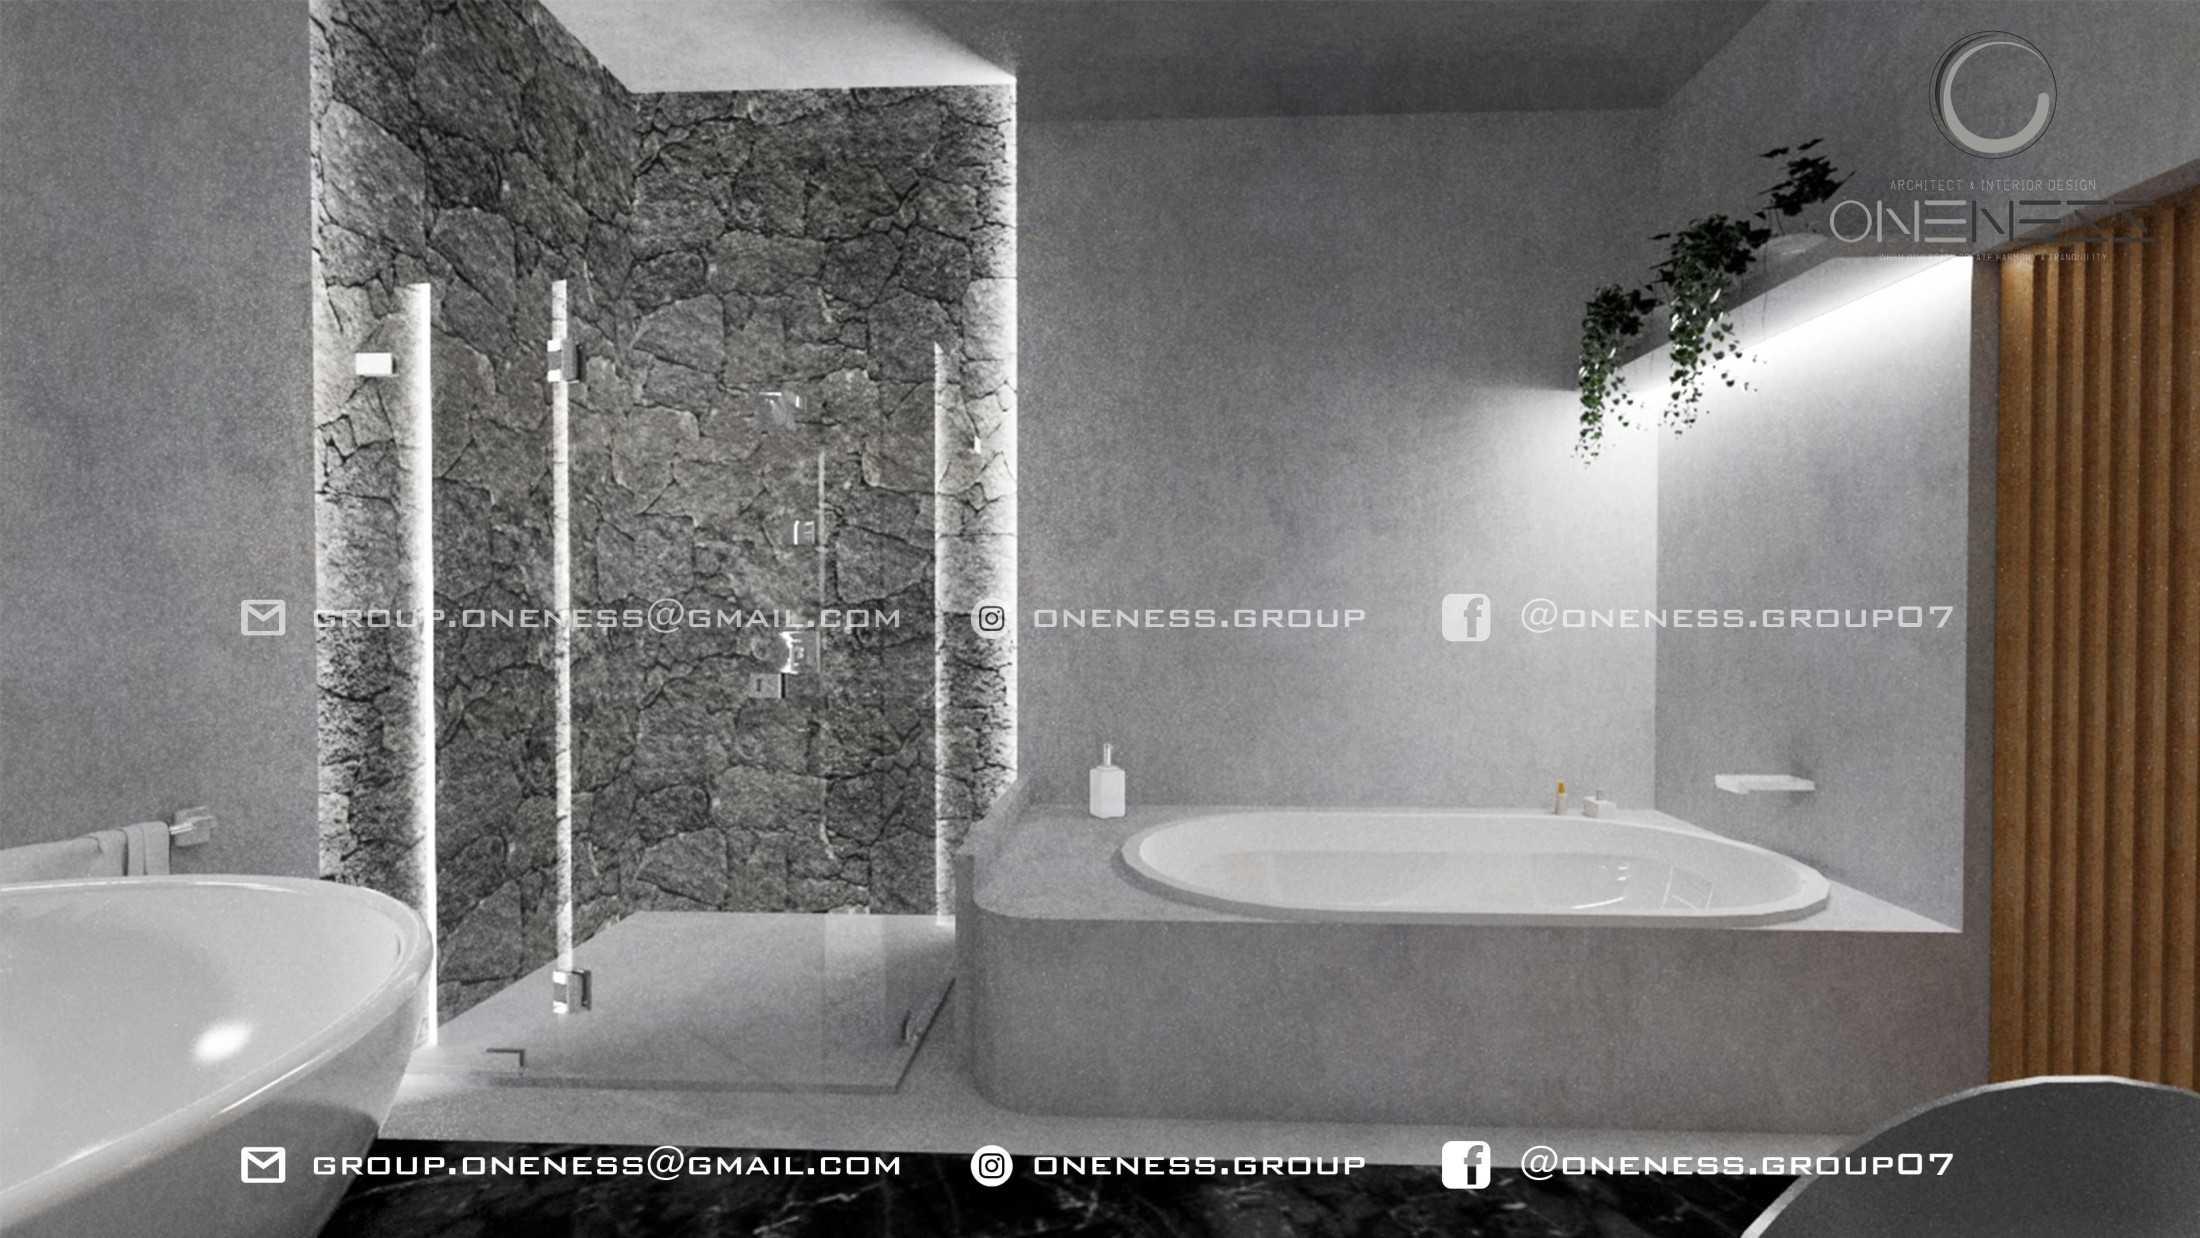 Oneness Group Villa Hijau Bali Bali, Indonesia Bali, Indonesia Toilet  98254